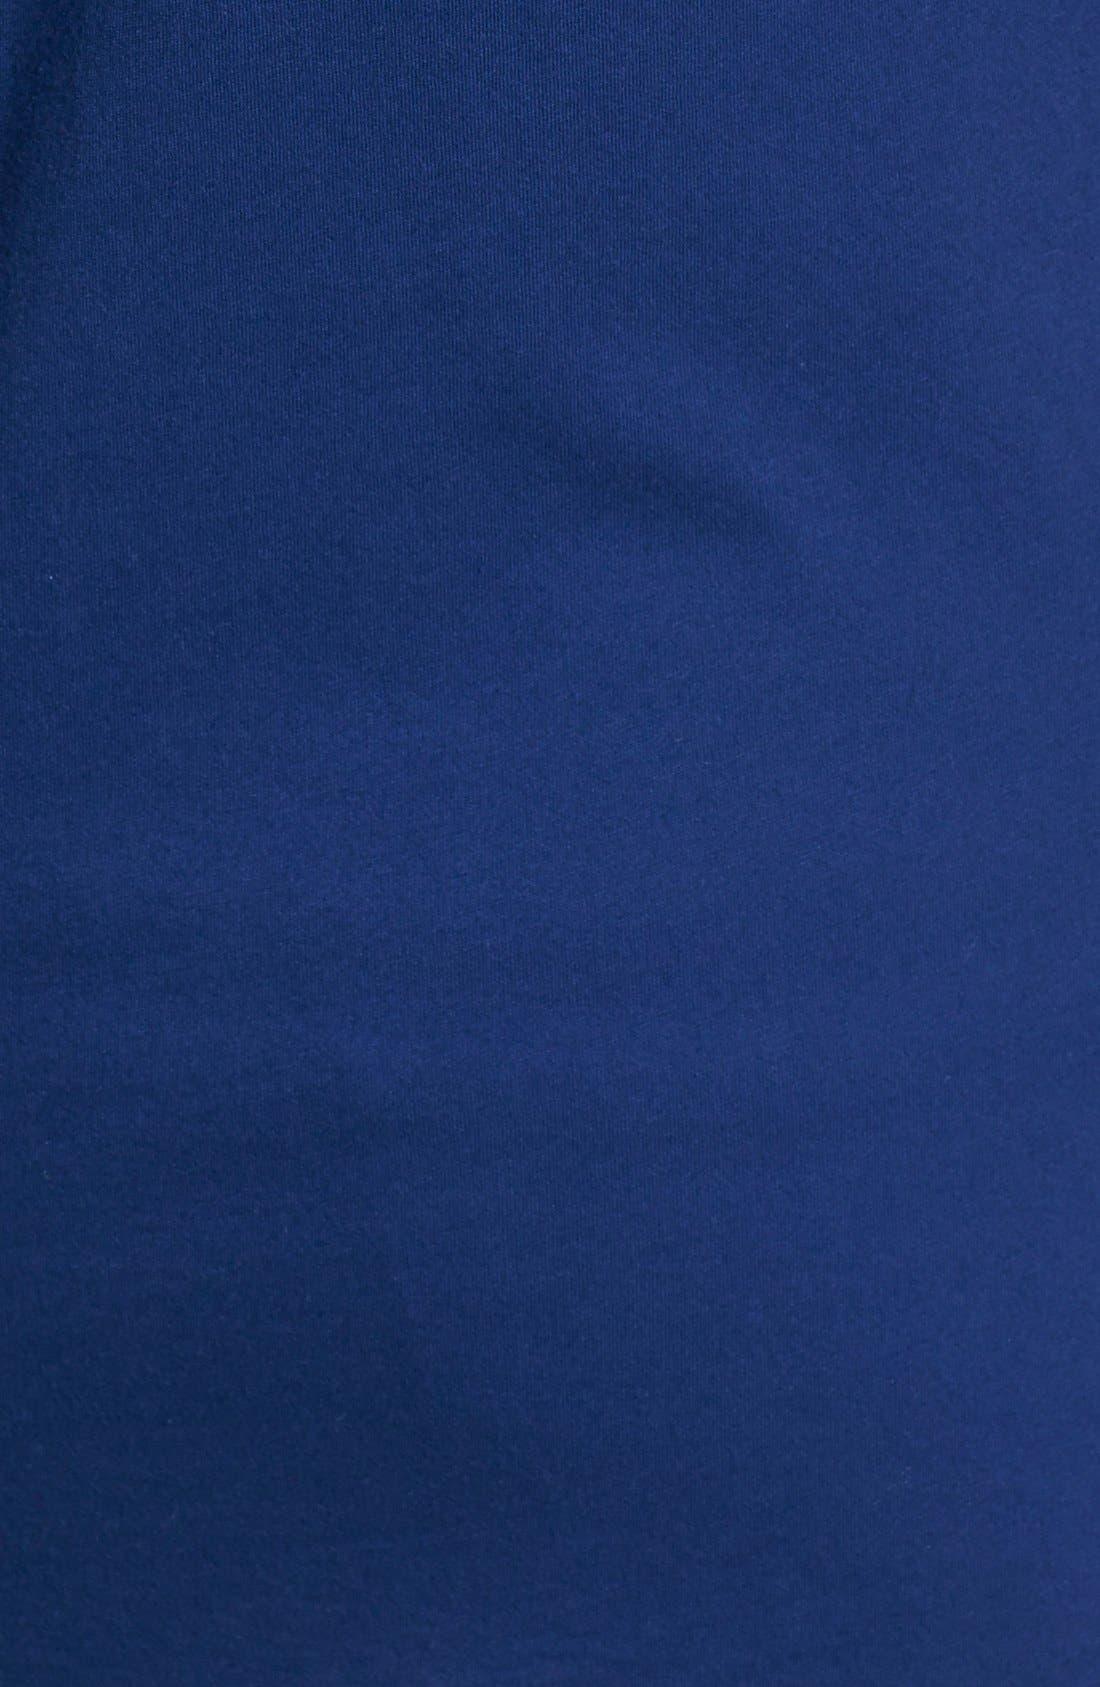 Alternate Image 2  - Signorelli Screenprint Cotton & Modal Tee